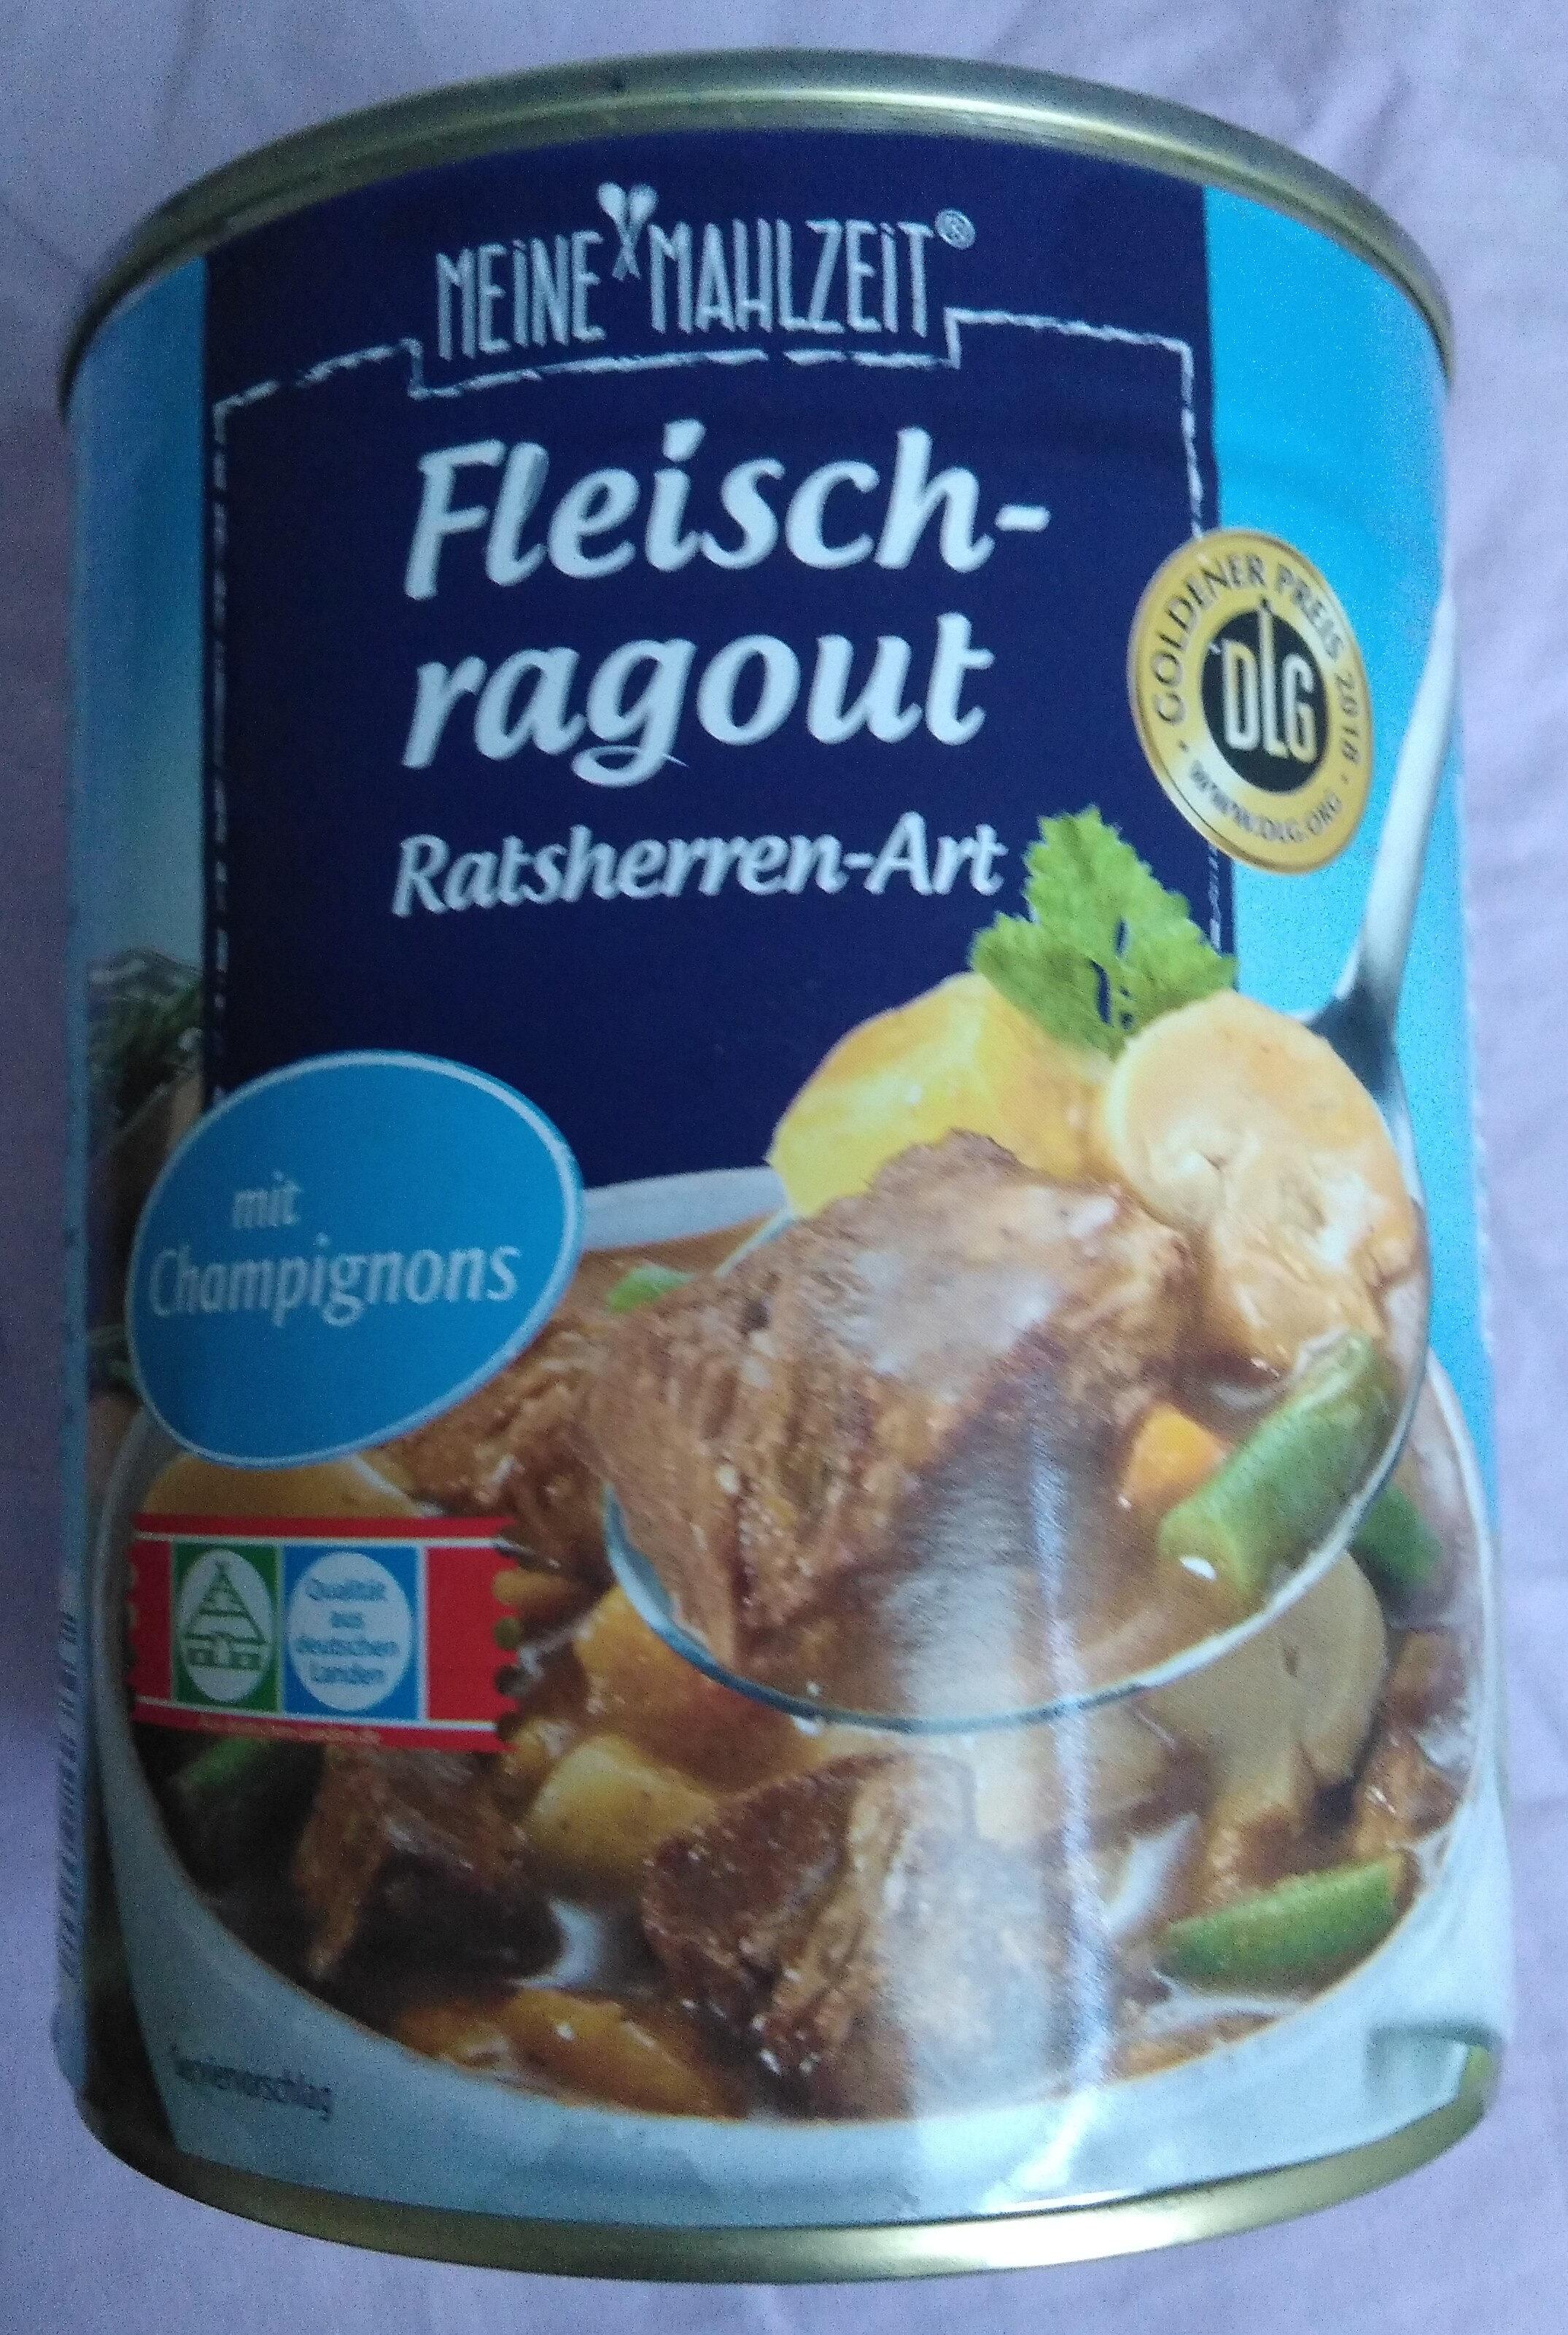 Fleischragout Ratsherren-Art - Product